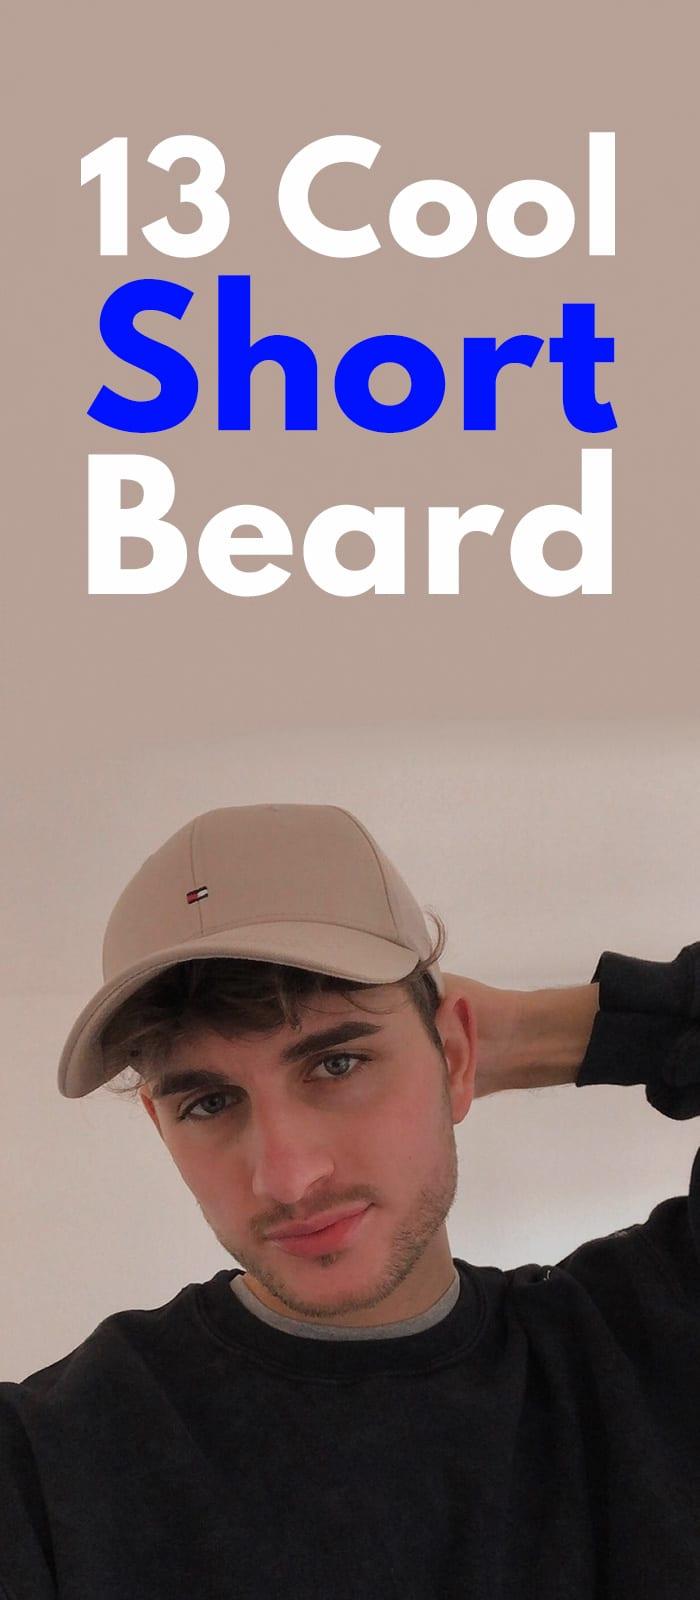 13 Cool Short Beard.